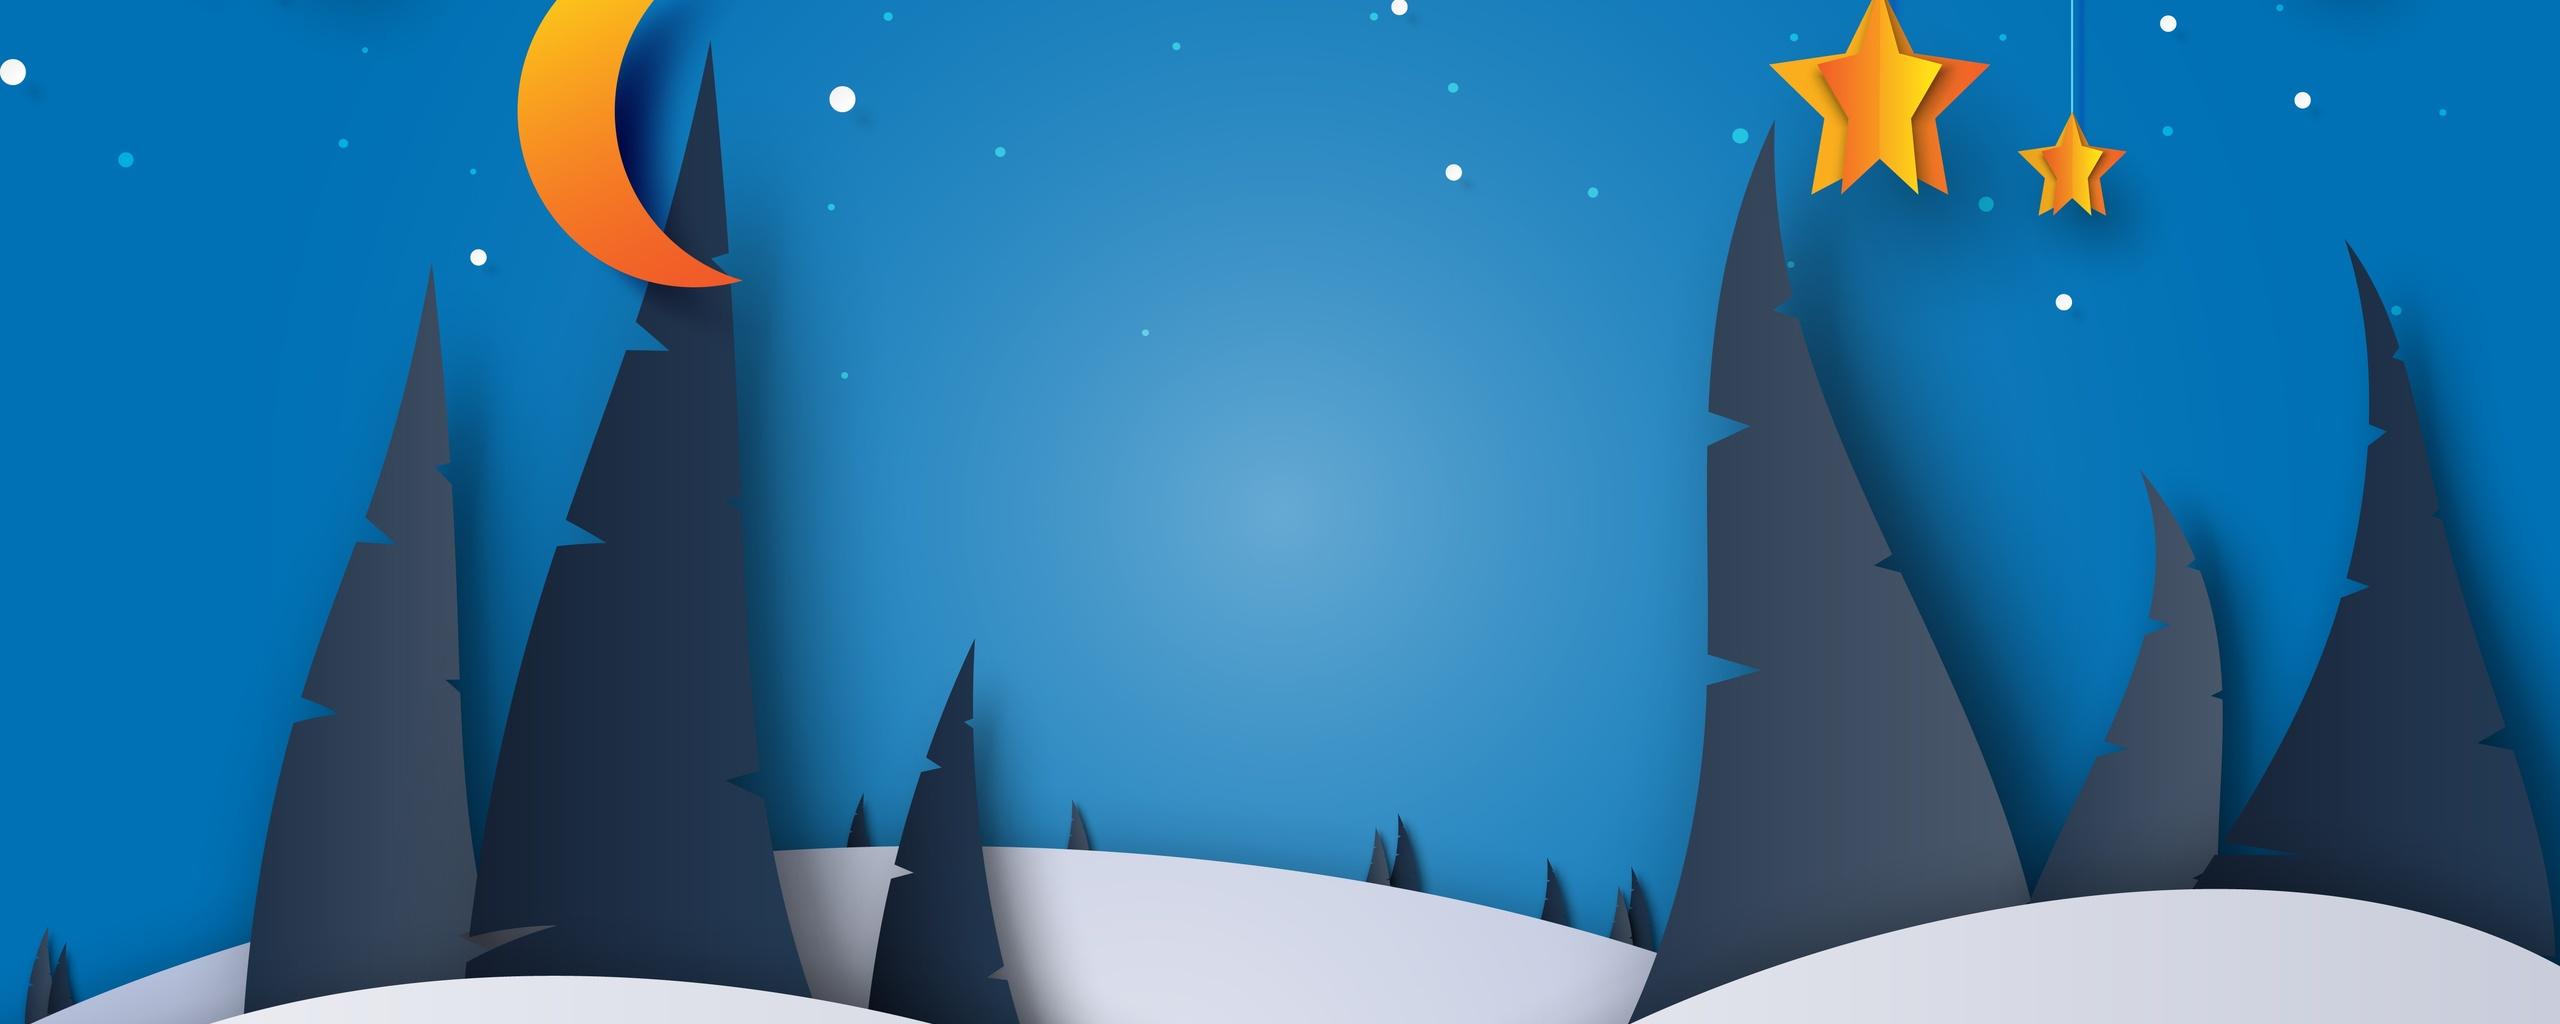 christmas-digital-art-5k-8b.jpg